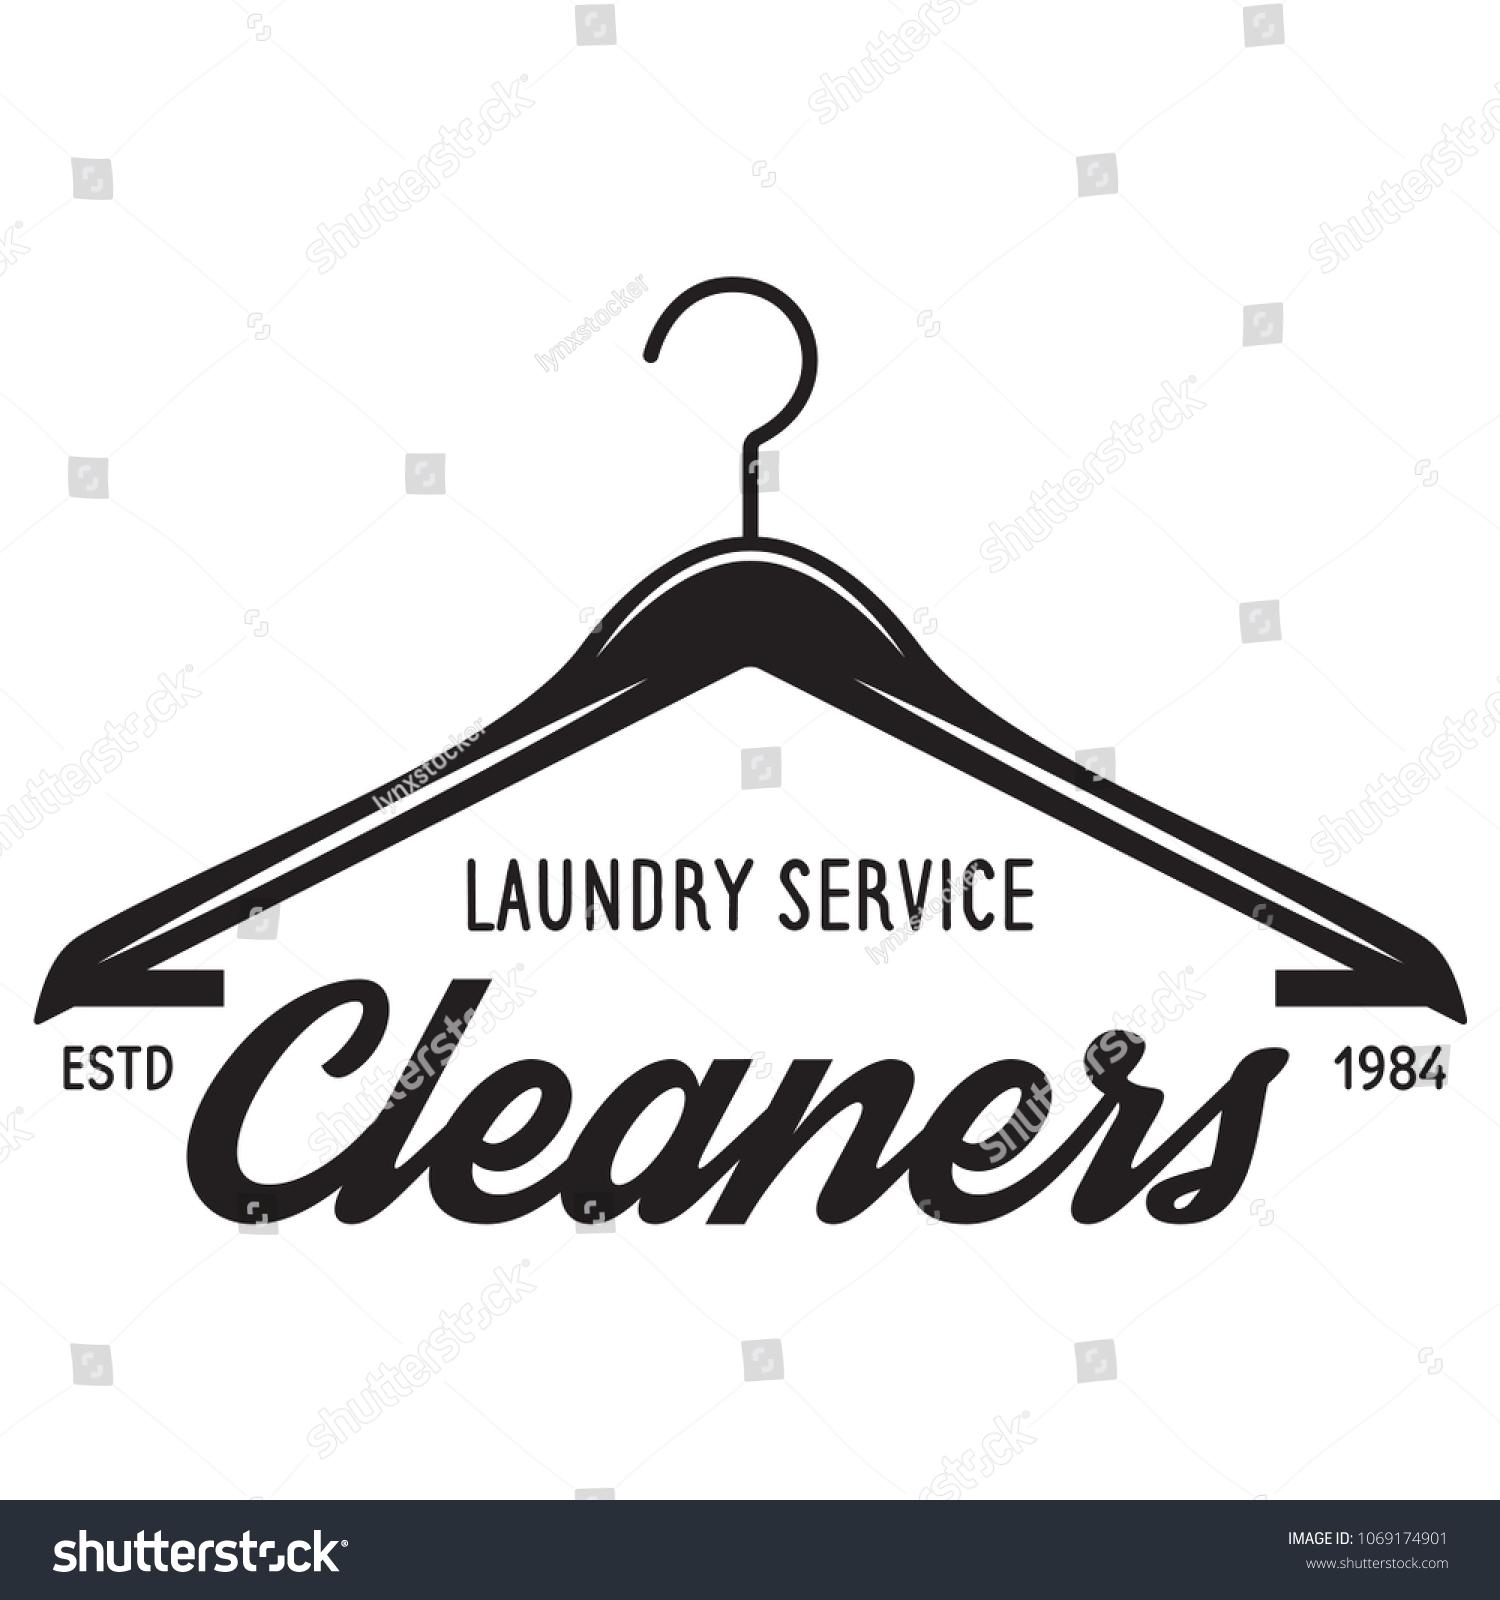 vector laundry logo emblem design element stock vector royalty free 1069174901 https www shutterstock com image vector vector laundry logo emblem design element 1069174901